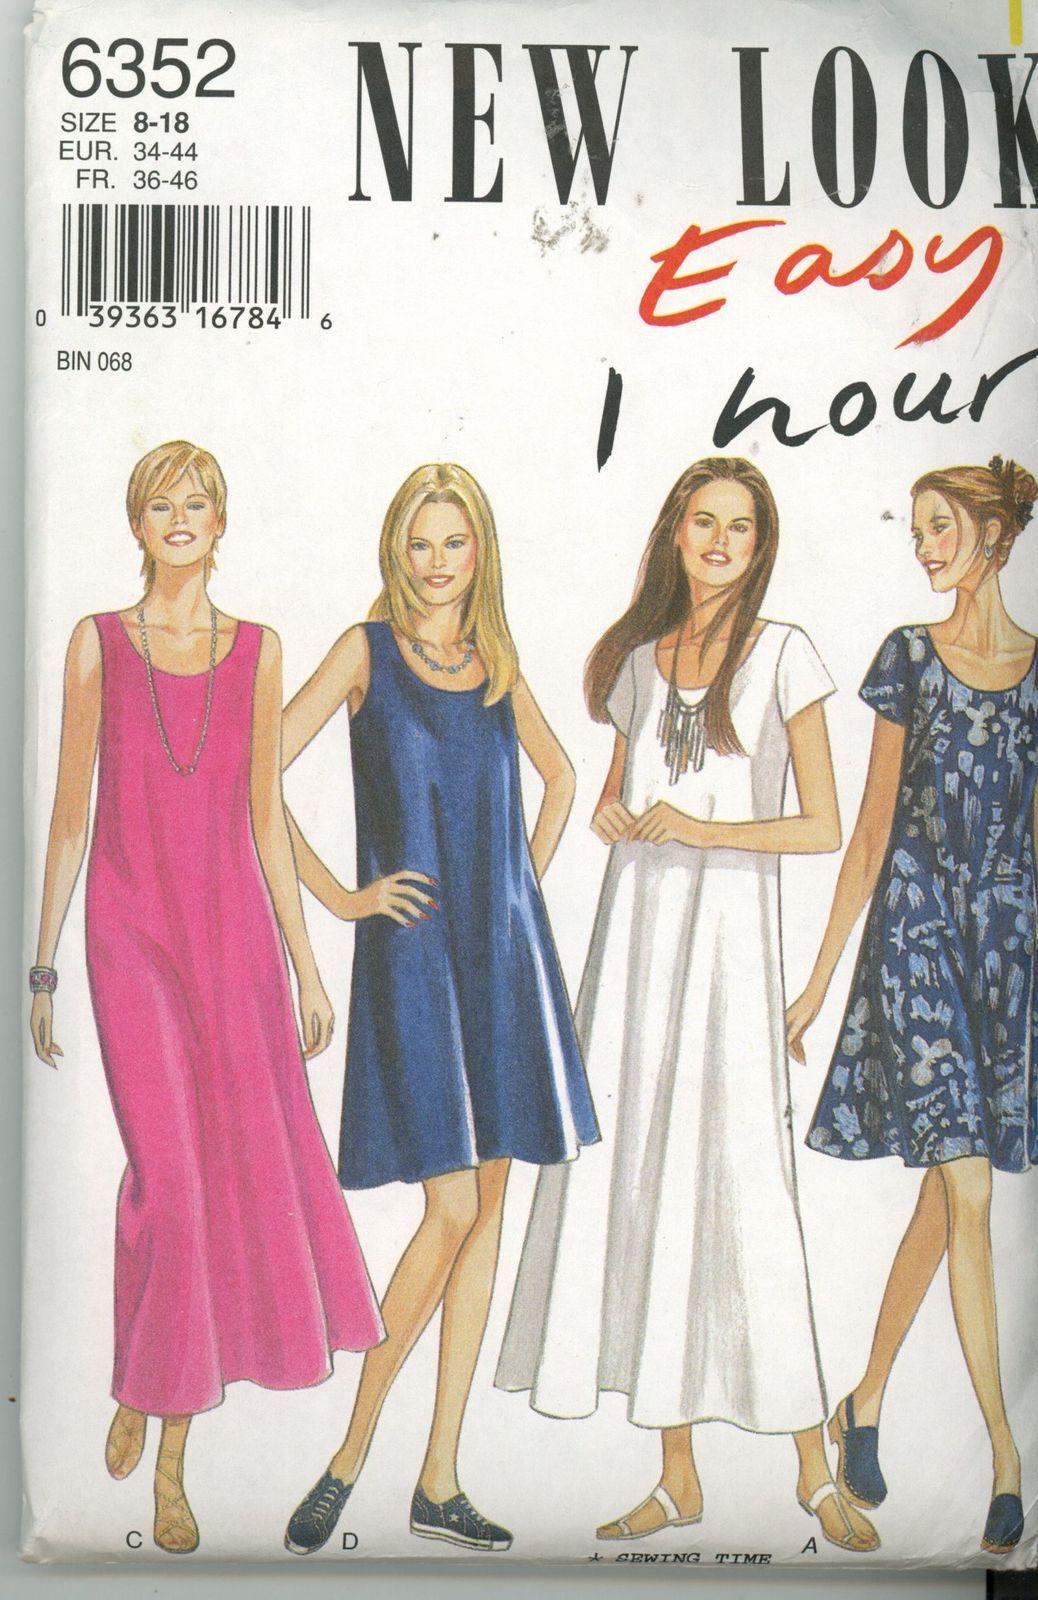 New look hour misses dress size uncut miss dress new